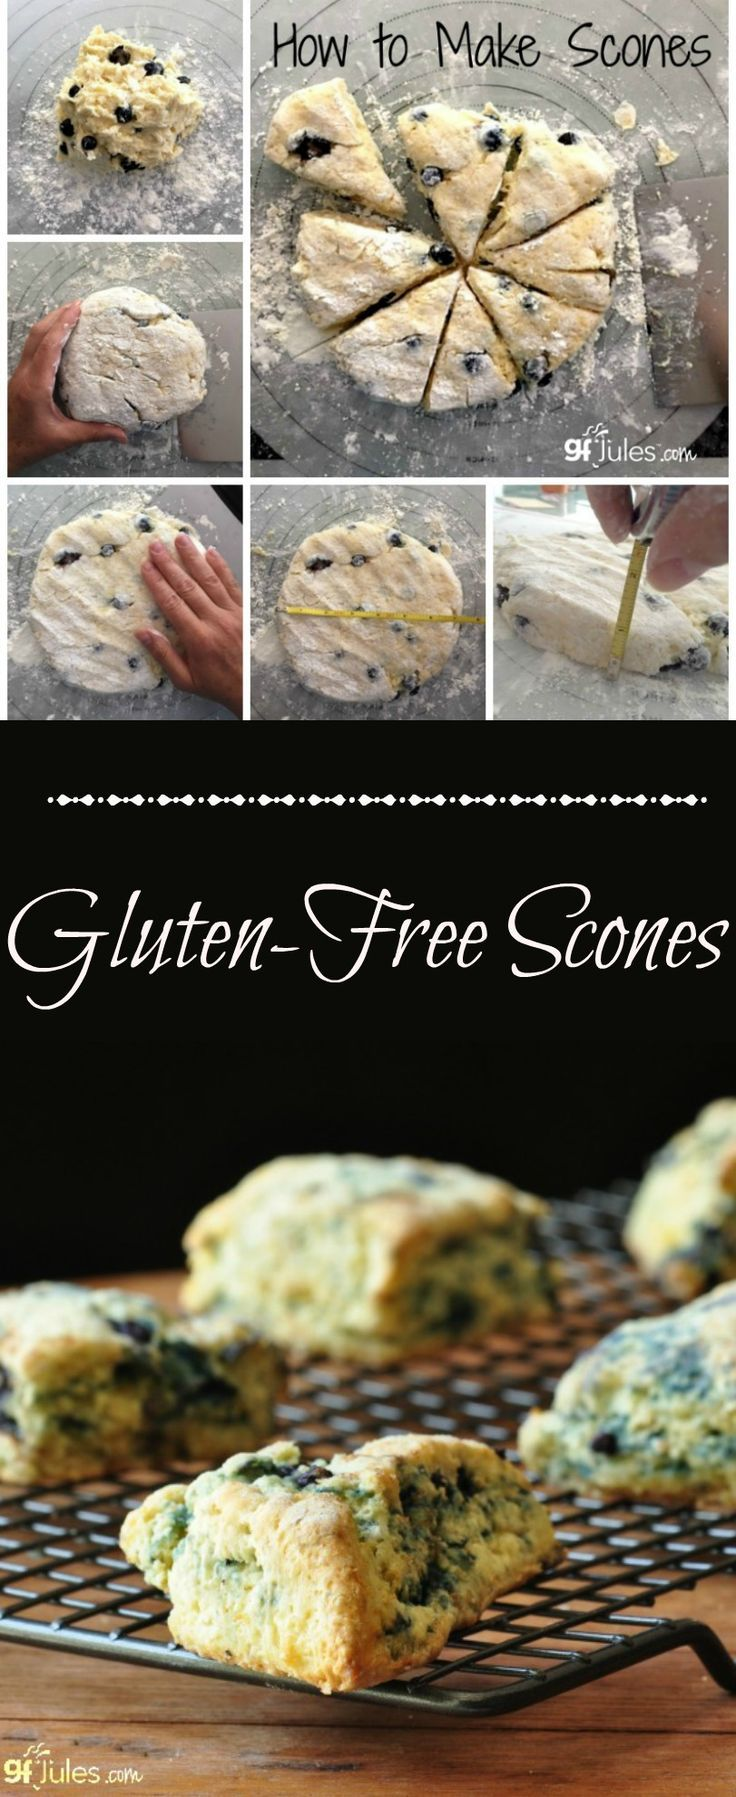 Easy Gluten Free Scones Recipe Gluten free scones